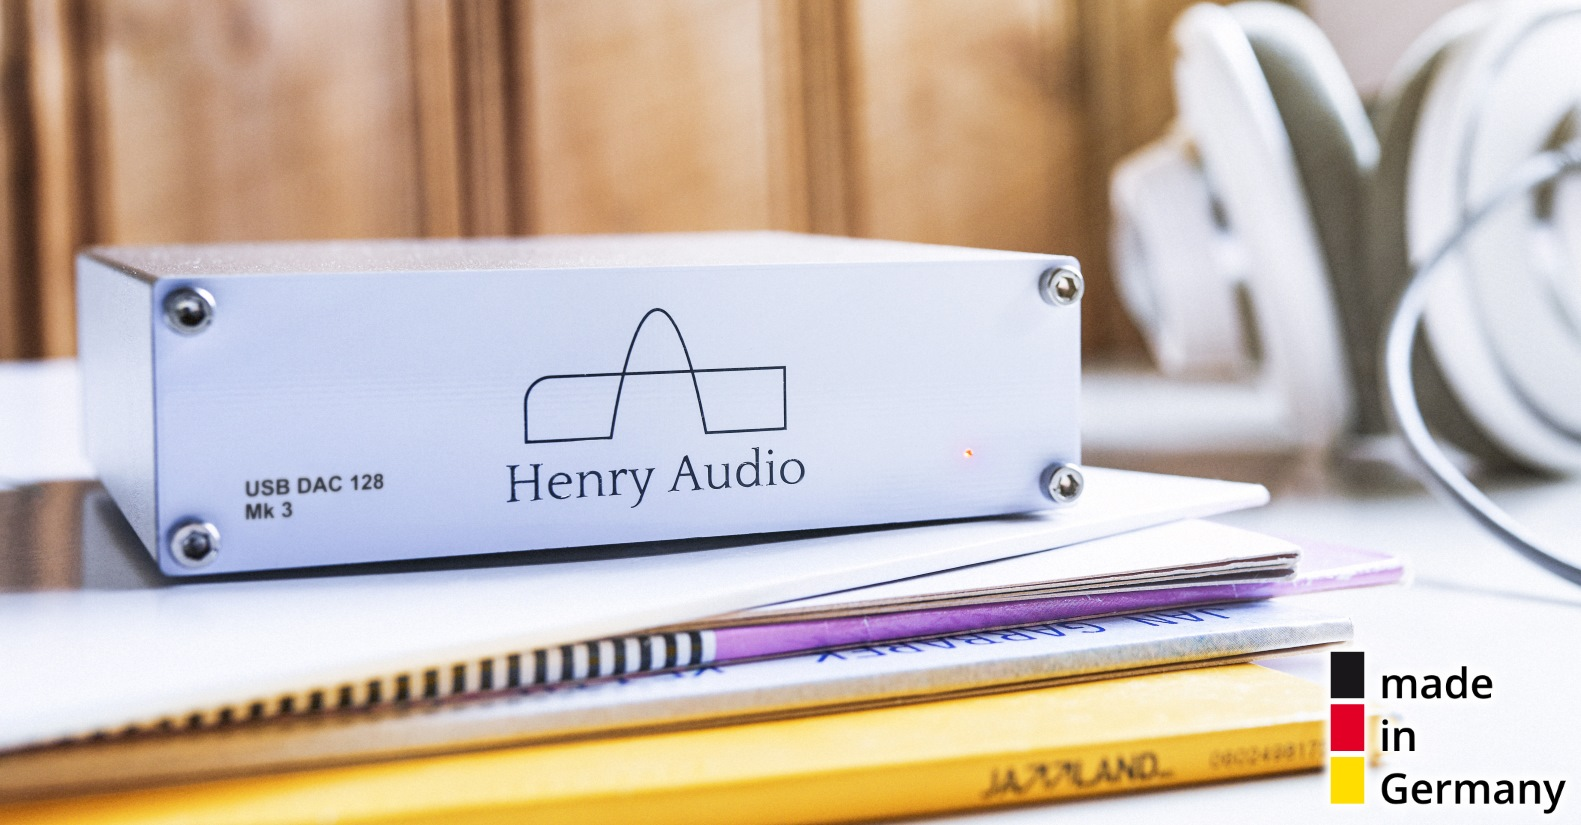 Henry Audio - High Fidelity USB DAC 128 Mk 3